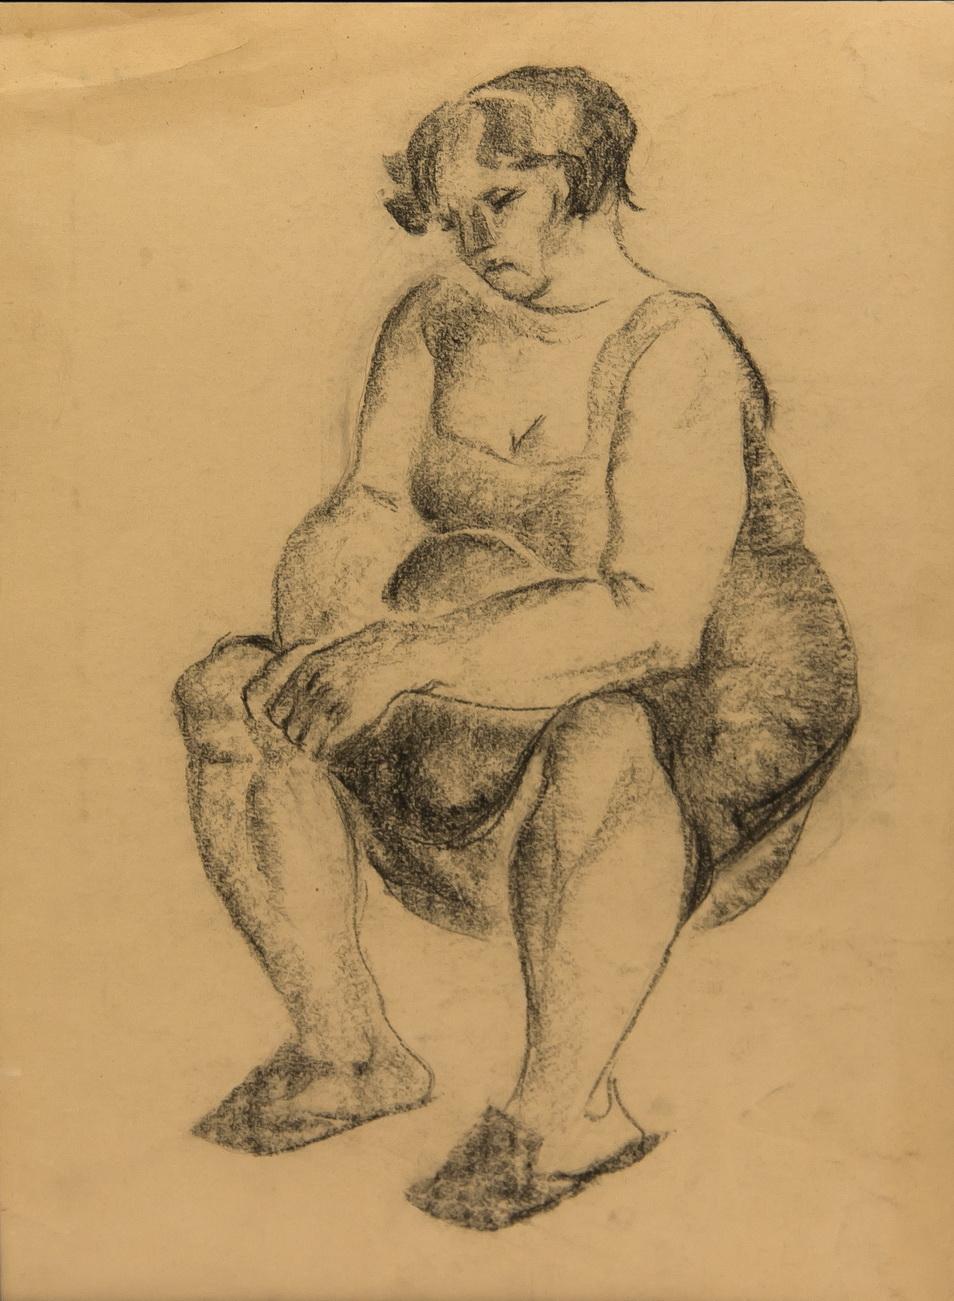 Фрейдин Александр: Фигуративизм. Сидящая женщина. Рисунок третий